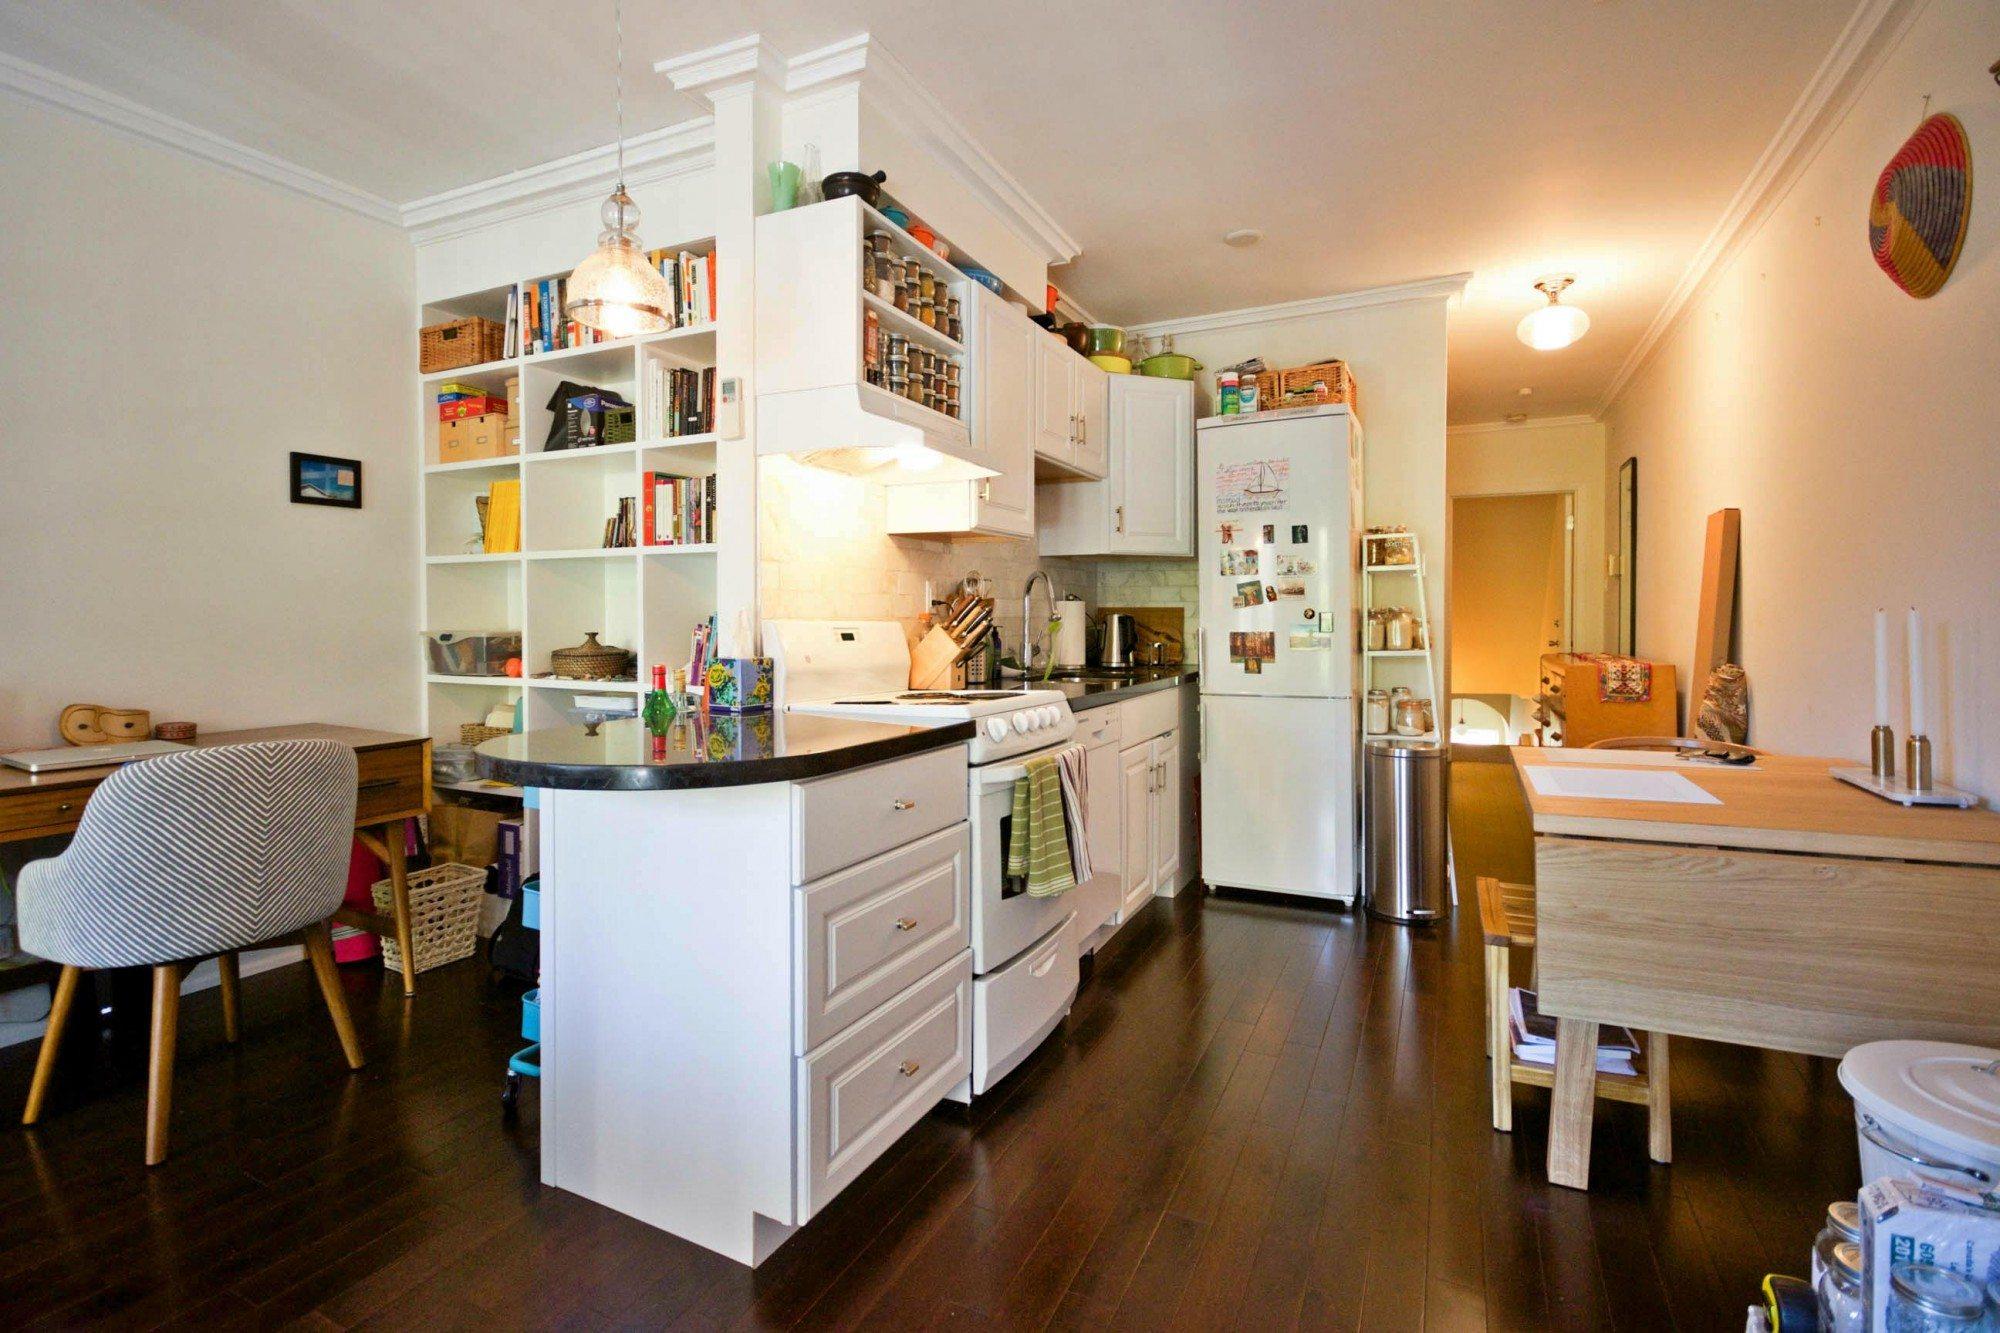 toronto-house-for-sale-81-pembroke-street-12